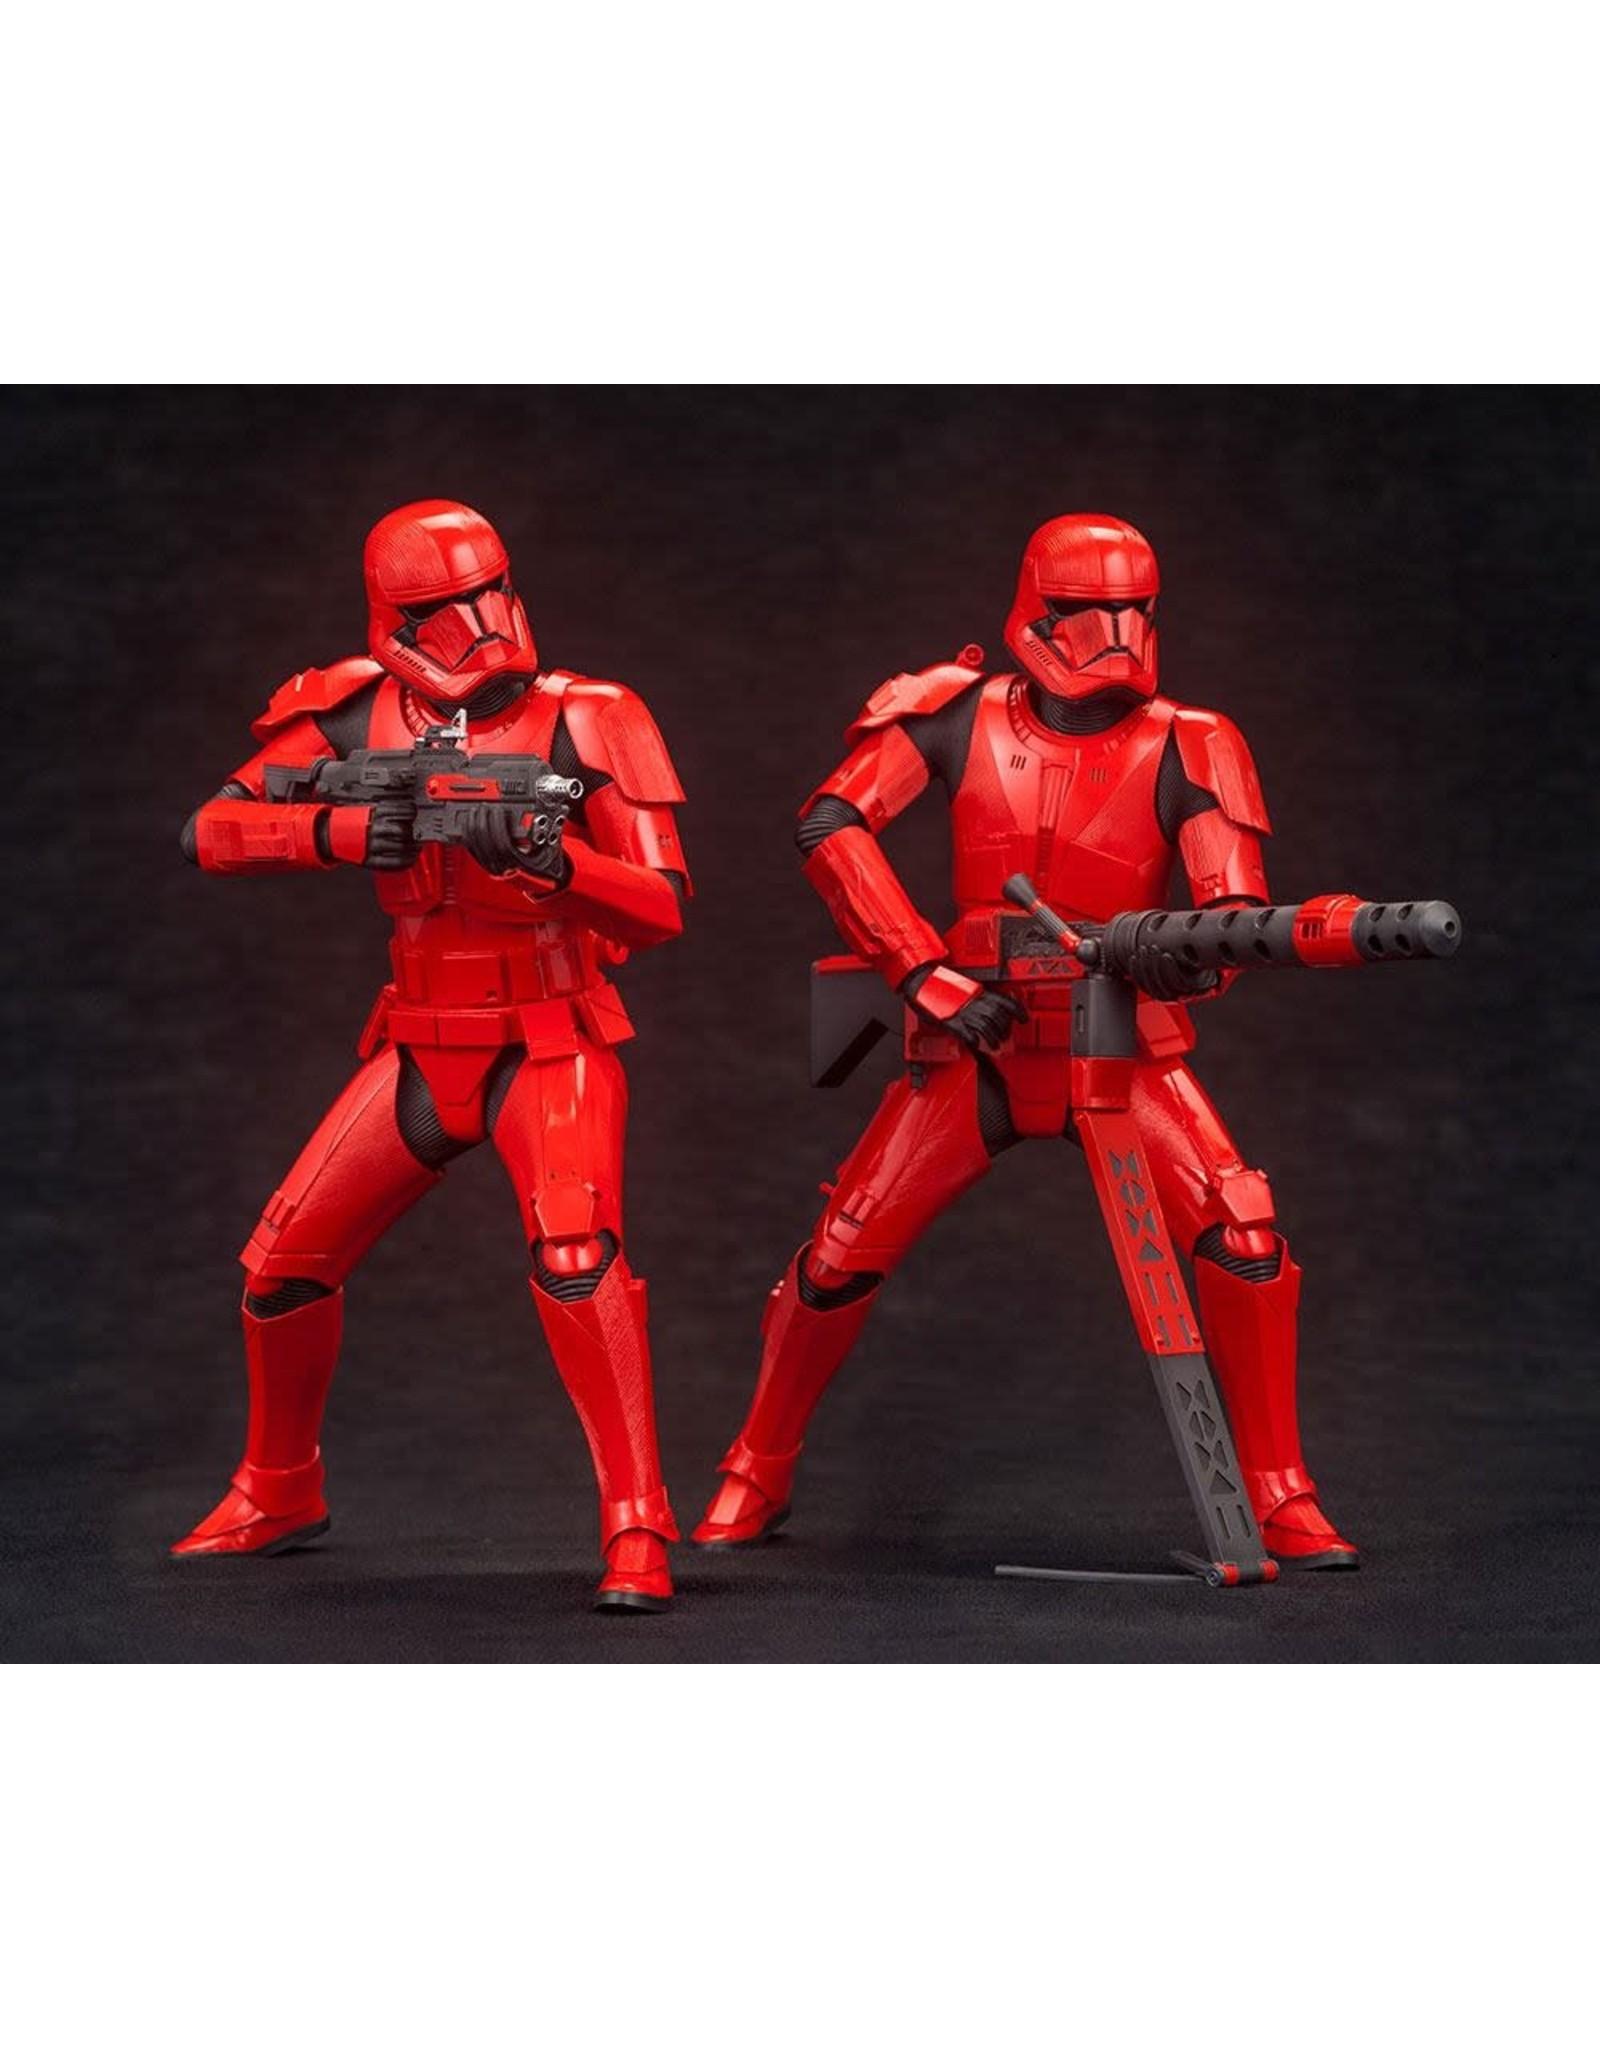 STAR WARS IX - Figurine ARTFXJ - 2 Figs Pack - Sith Troopers